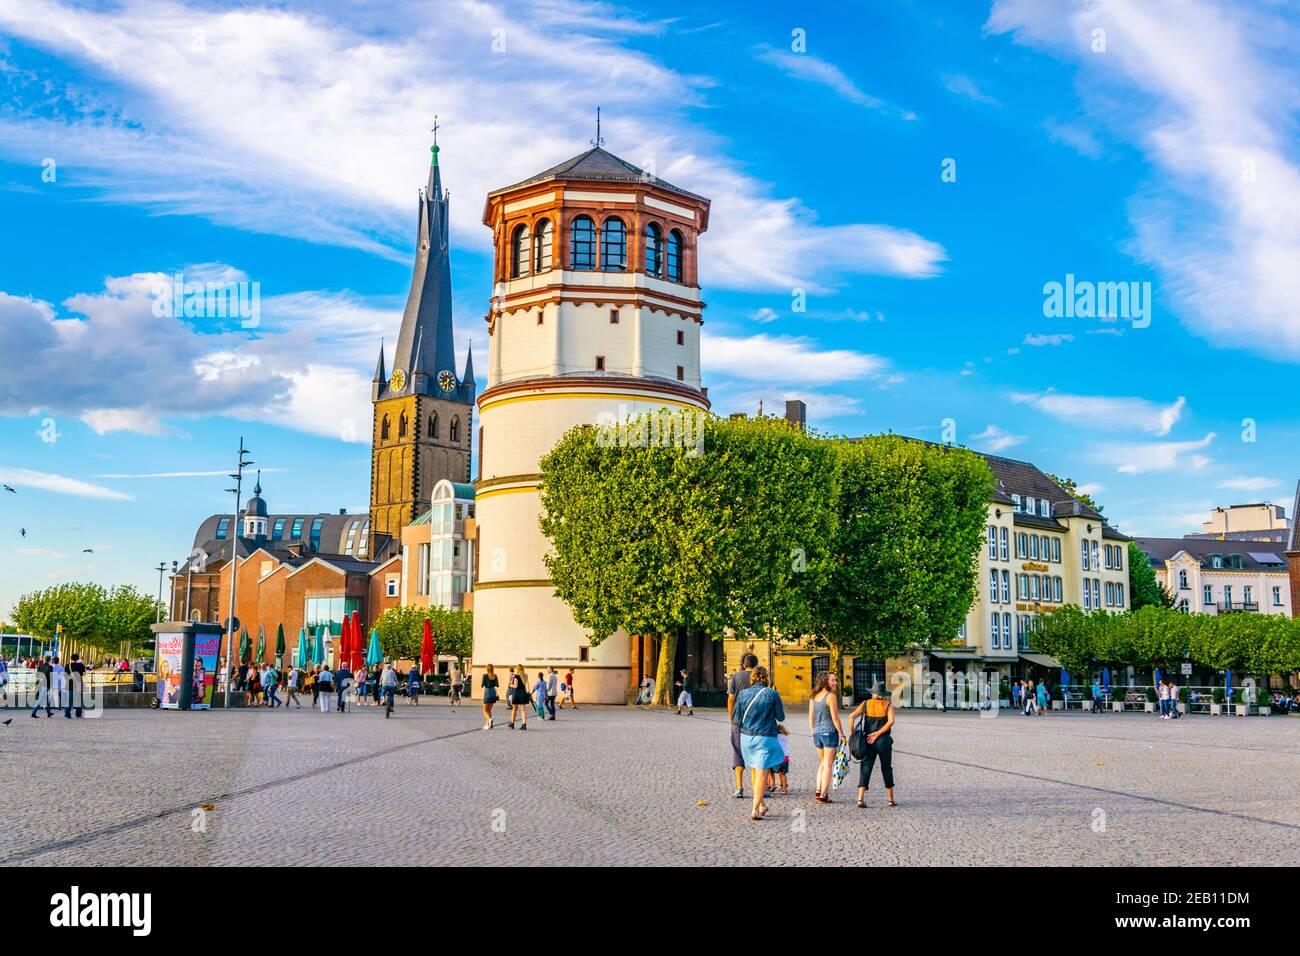 DUSSELDORF, GERMANY, AUGUST 10, 2018: View of Burgplatz with Schifffahrt museum and Saint Lambertus church in Dusseldorf, Germany Stock Photo